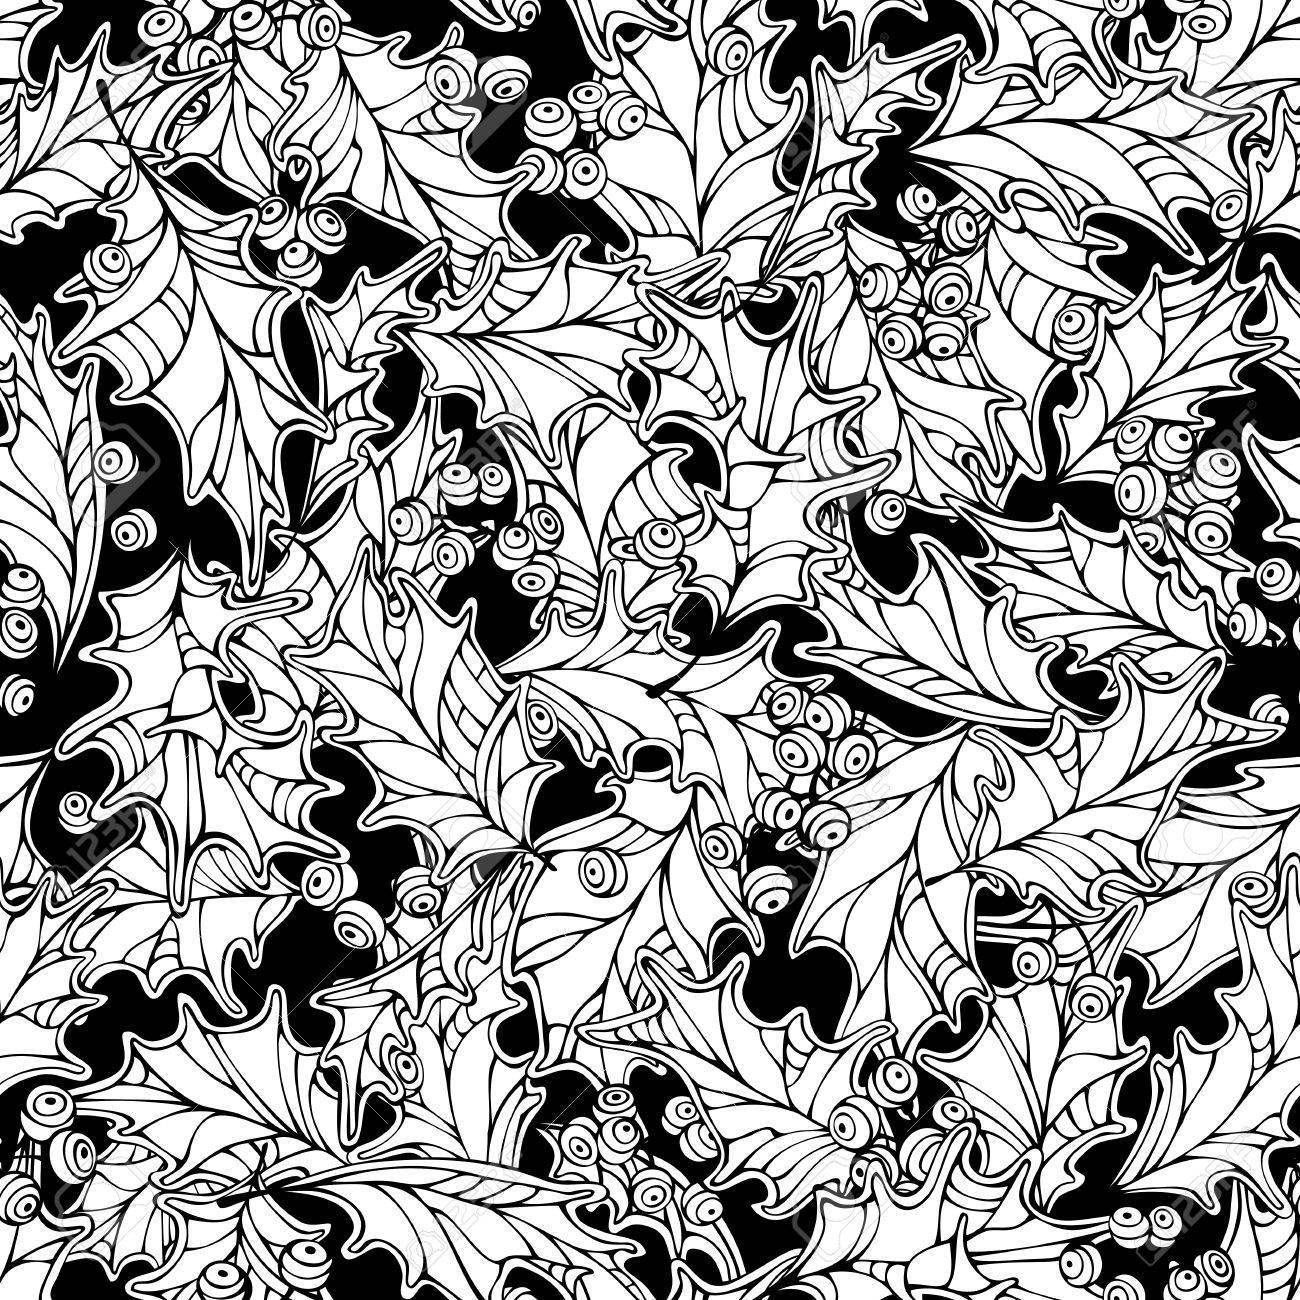 1300x1300 Christmas Mistletoe Seamless Pattern. Black And White Holly